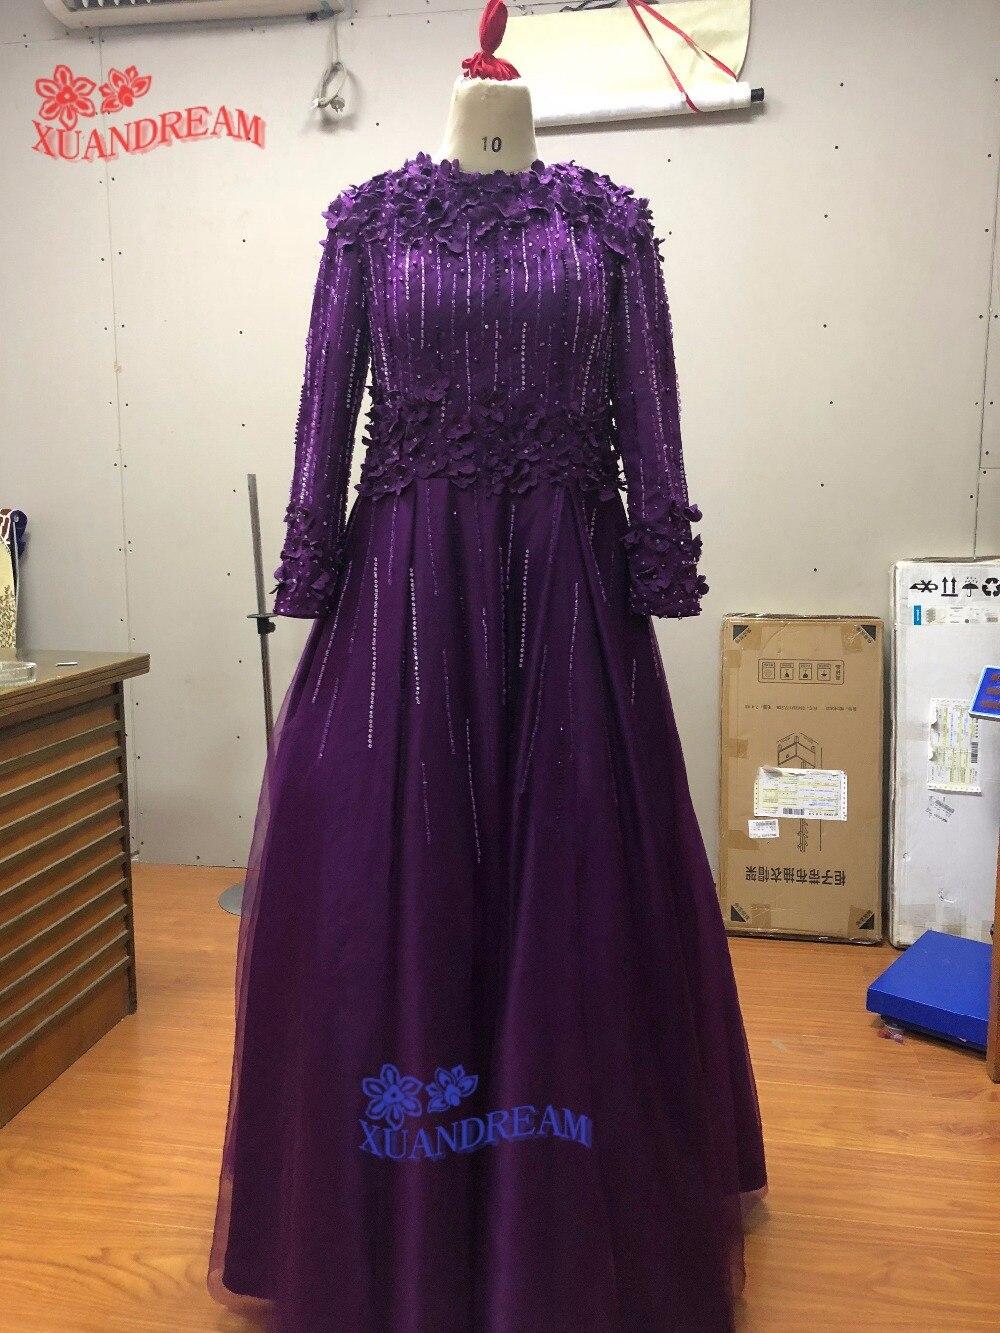 100 real made hot instagram evening dress vestidos de festa formal long sleeves with 3D flower